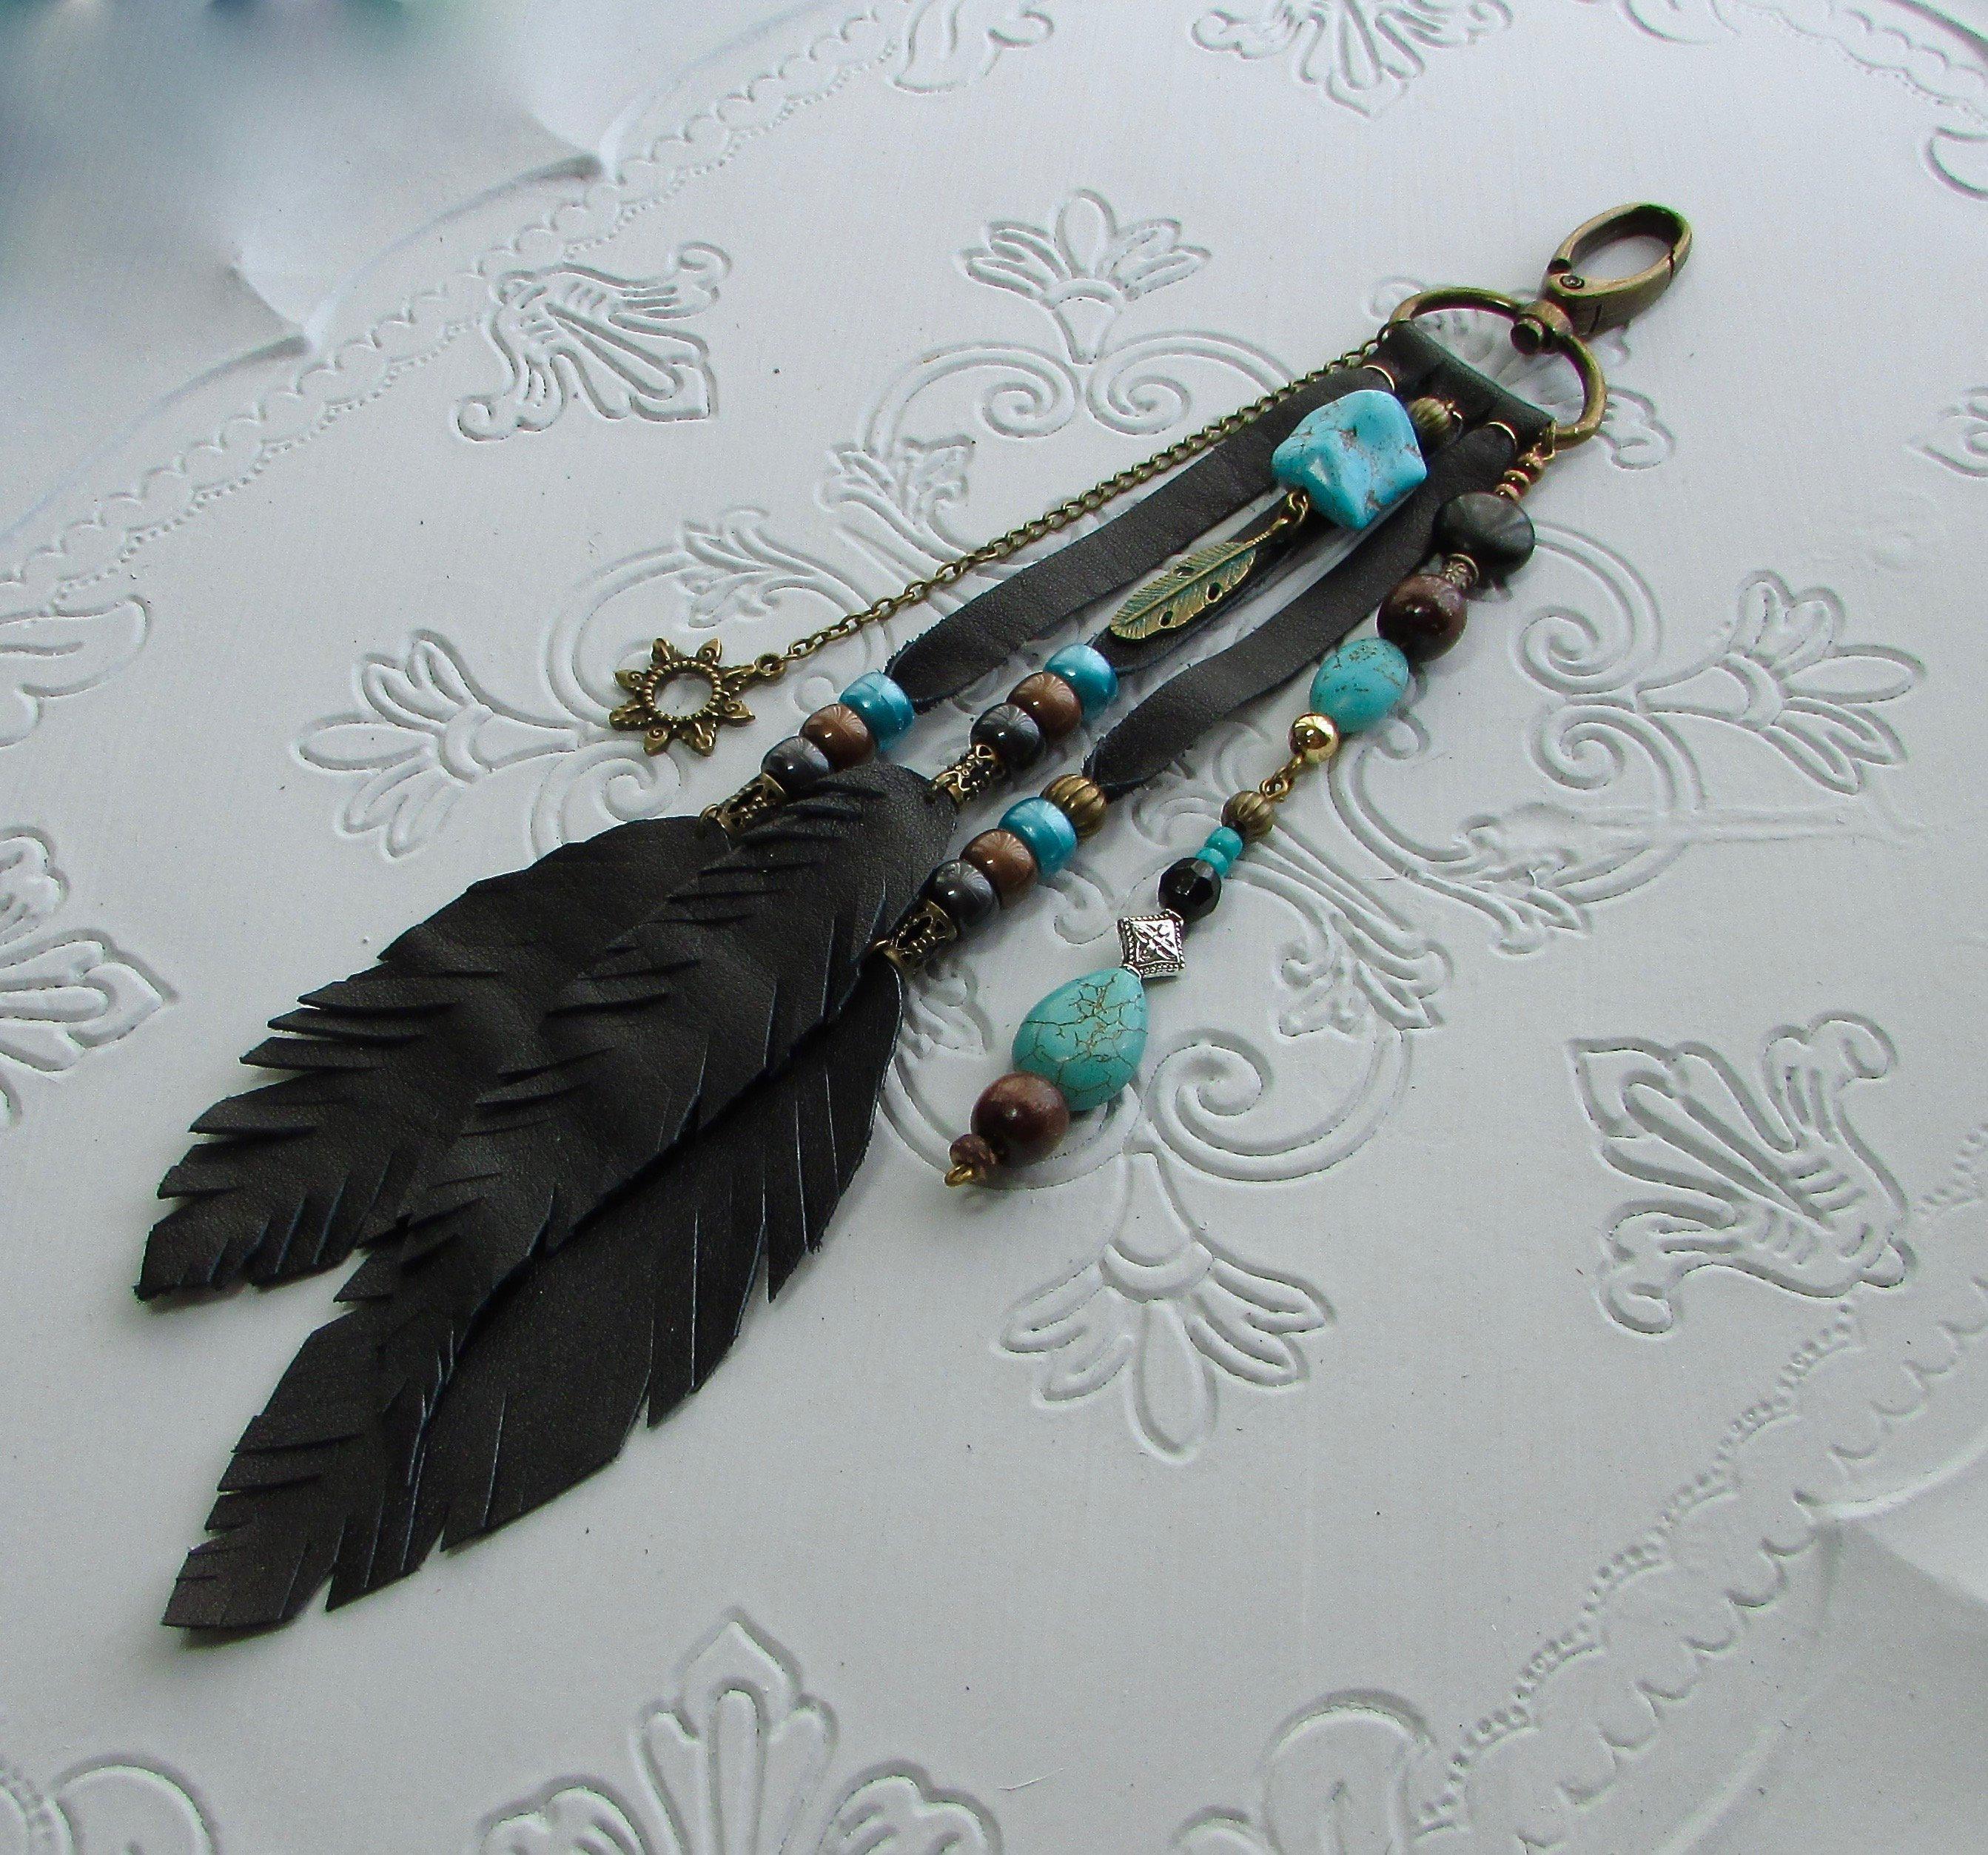 Feather Keychain Western Keychain Gifts for Her Native American Keychain Southwest Keychain